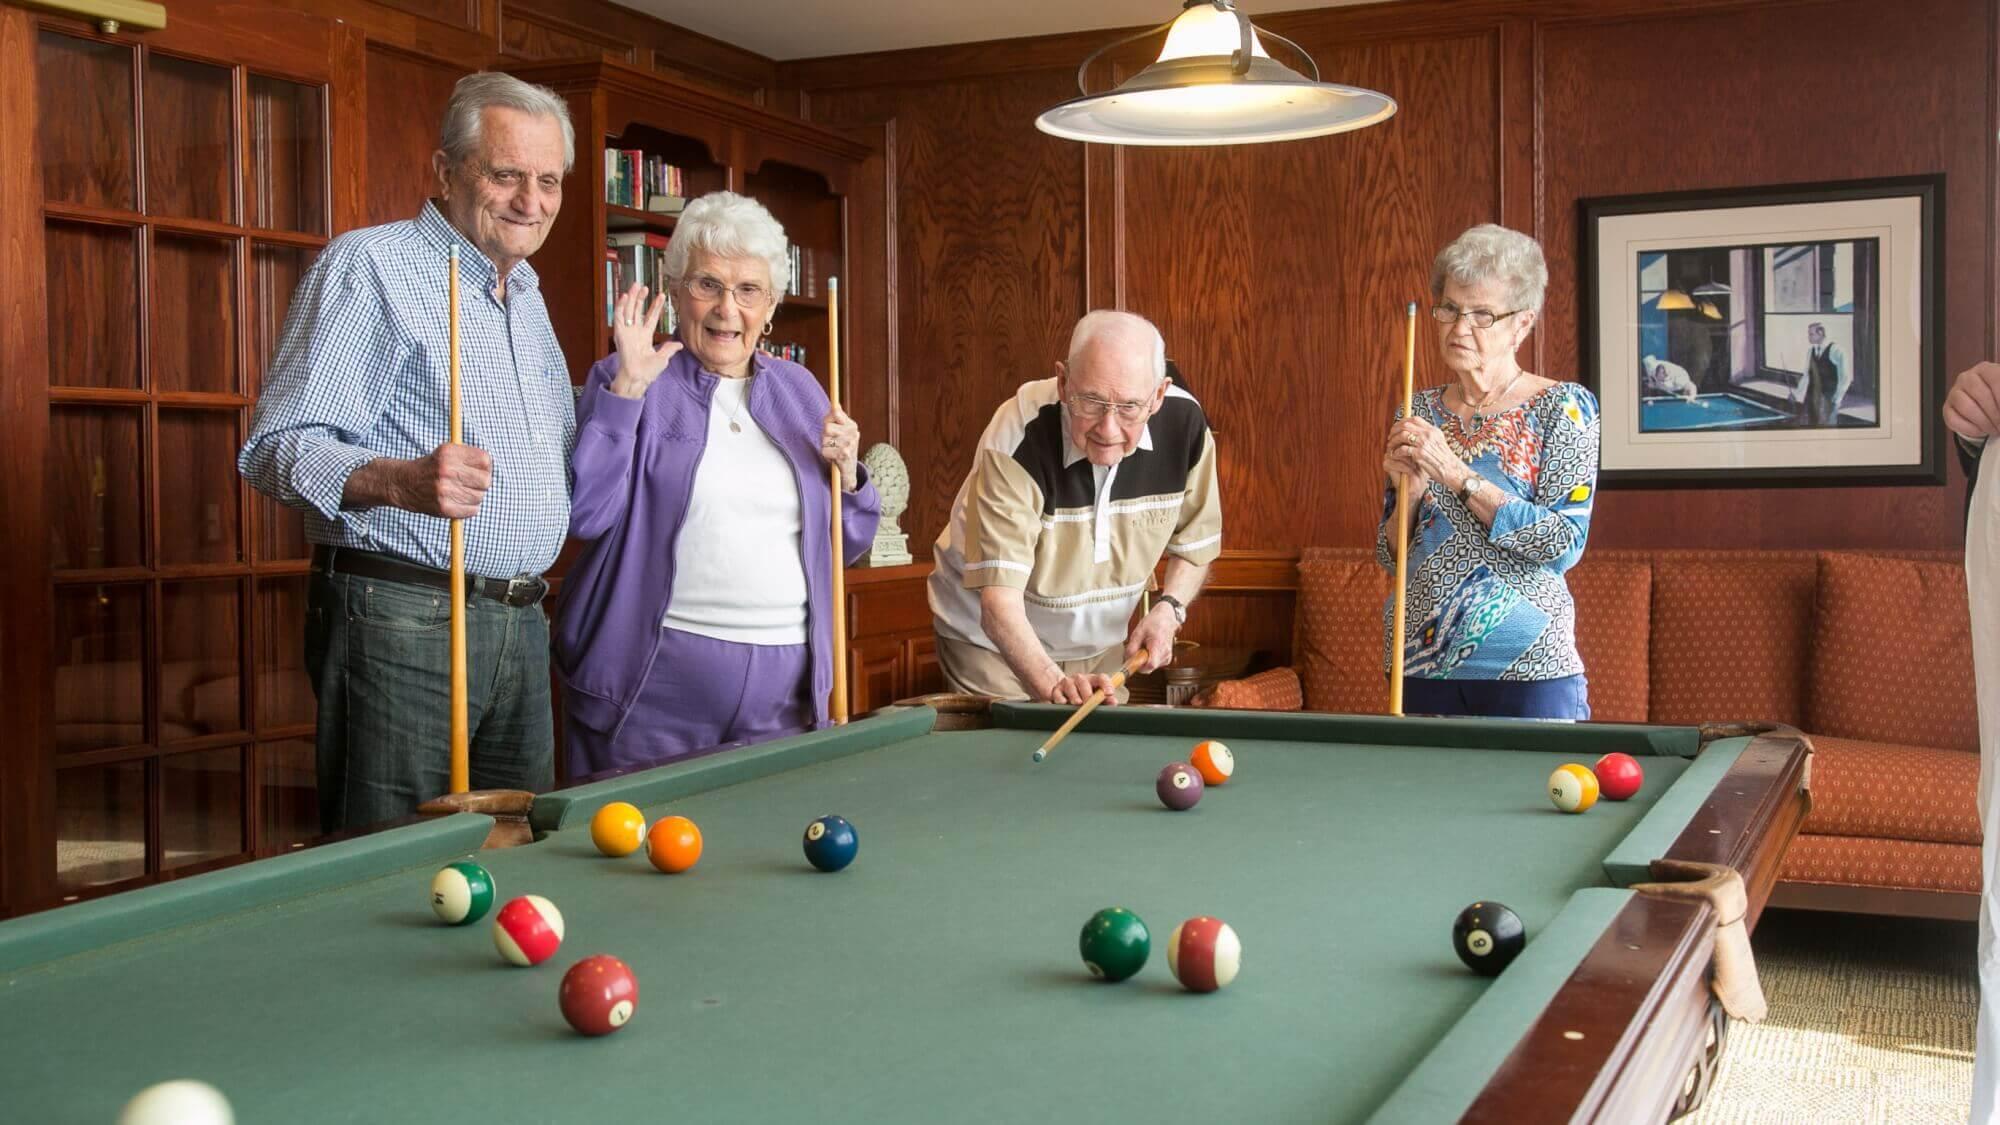 Senior friends playing billiards together celebrating a shot